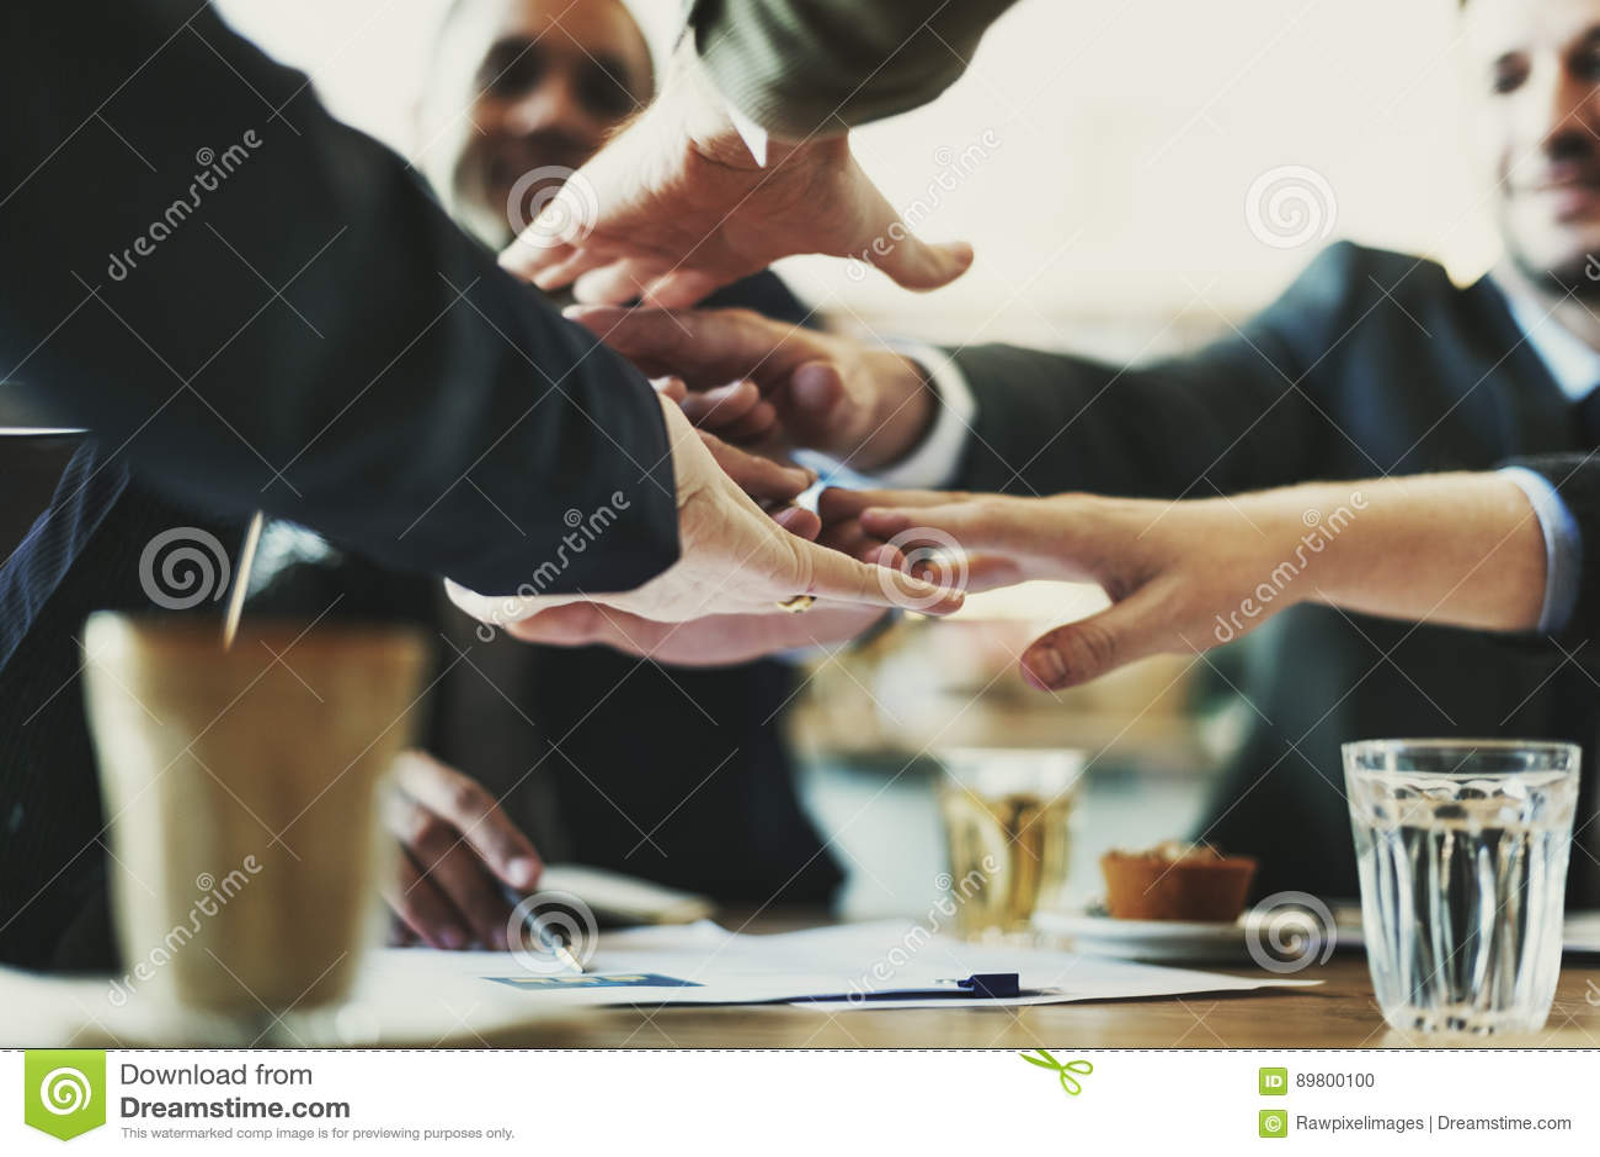 Team Unity Friends Meeting Partnership-Concept